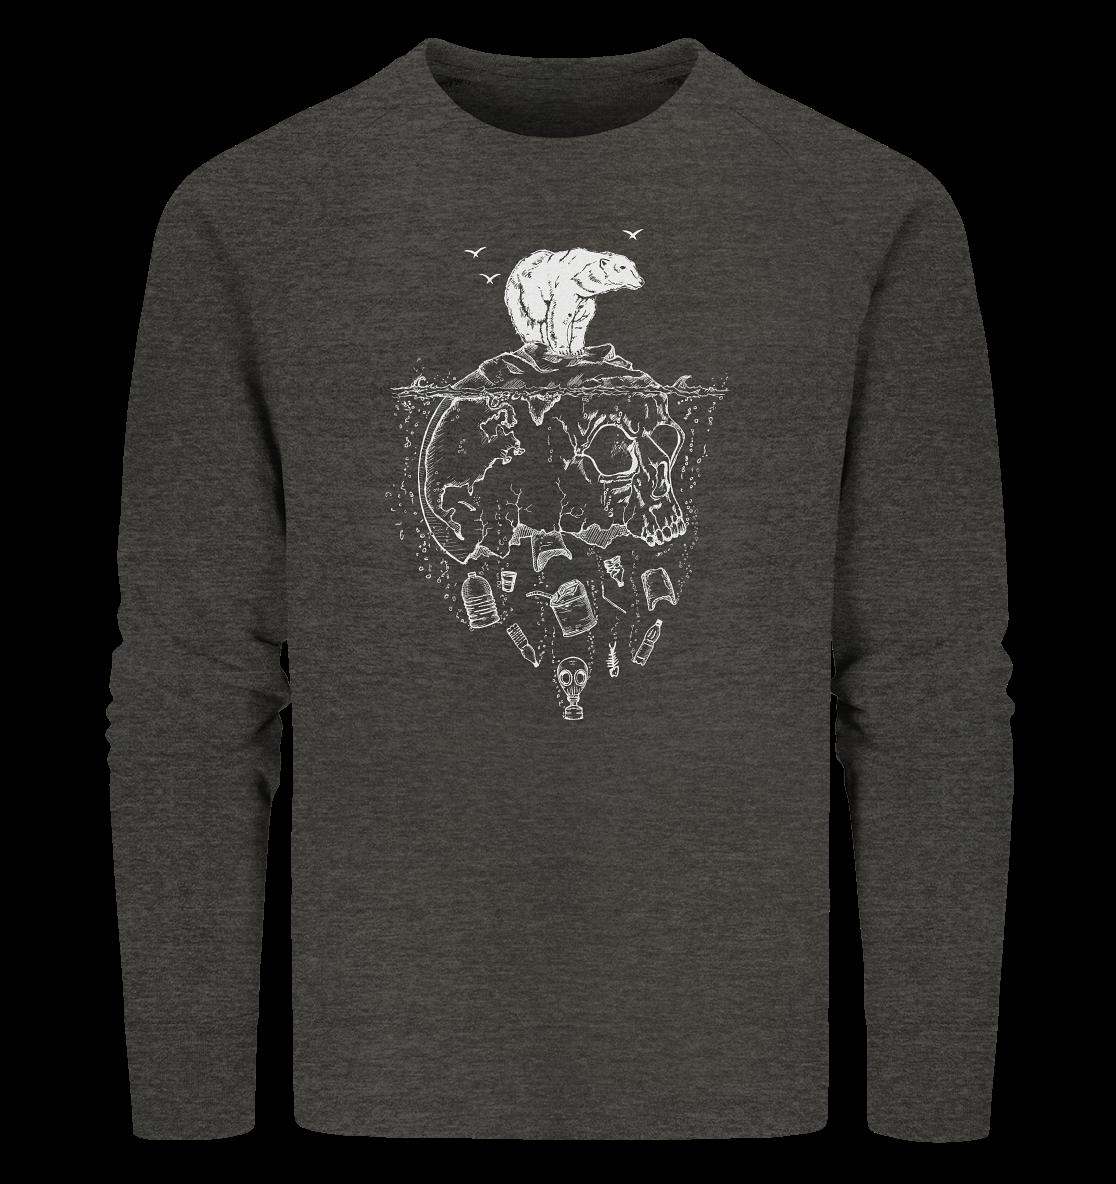 front-organic-sweatshirt-252625-1116x-4.png